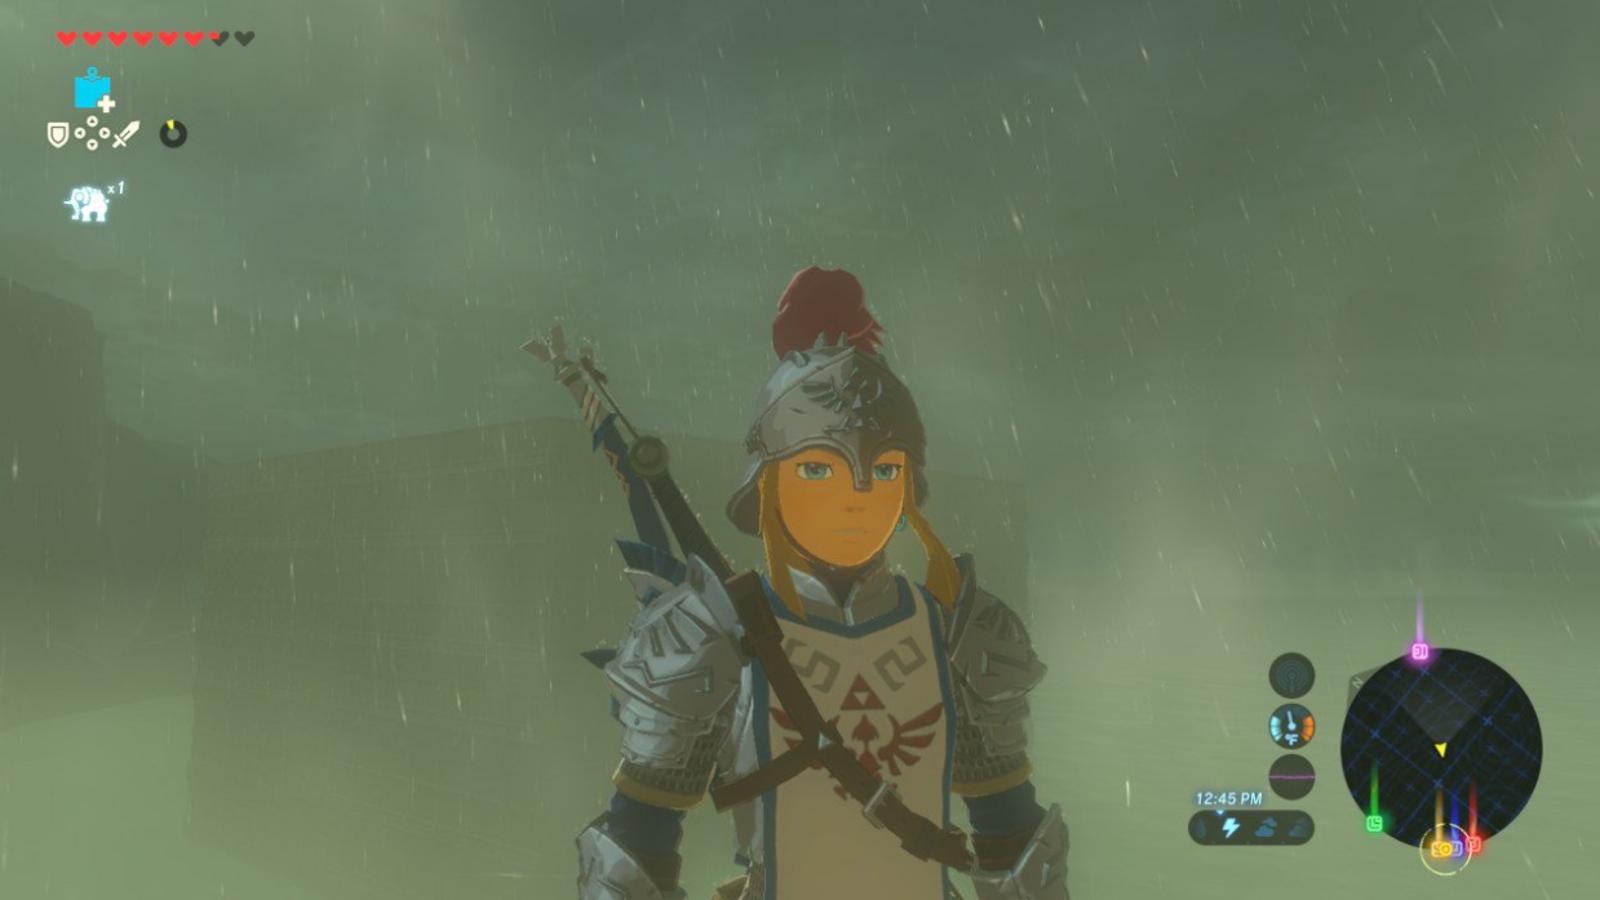 I Swear, If It Rains In Zelda: Breath of the Wild One More